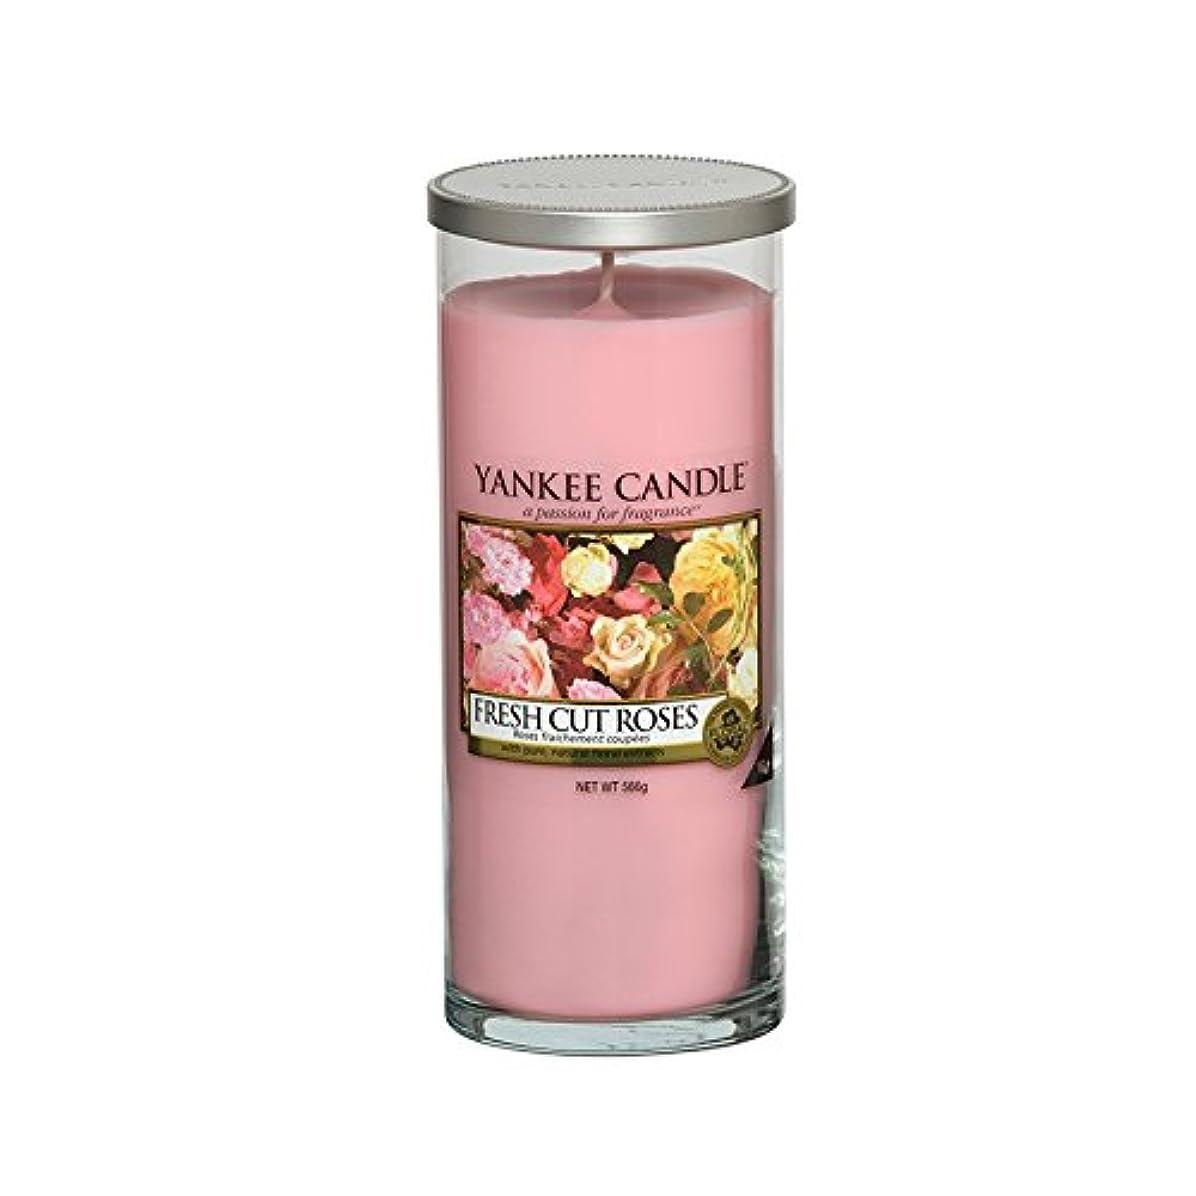 Yankee Candles Large Pillar Candle - Fresh Cut Roses (Pack of 6) - ヤンキーキャンドル大きな柱キャンドル - 新鮮なバラ切り花 (x6) [並行輸入品]